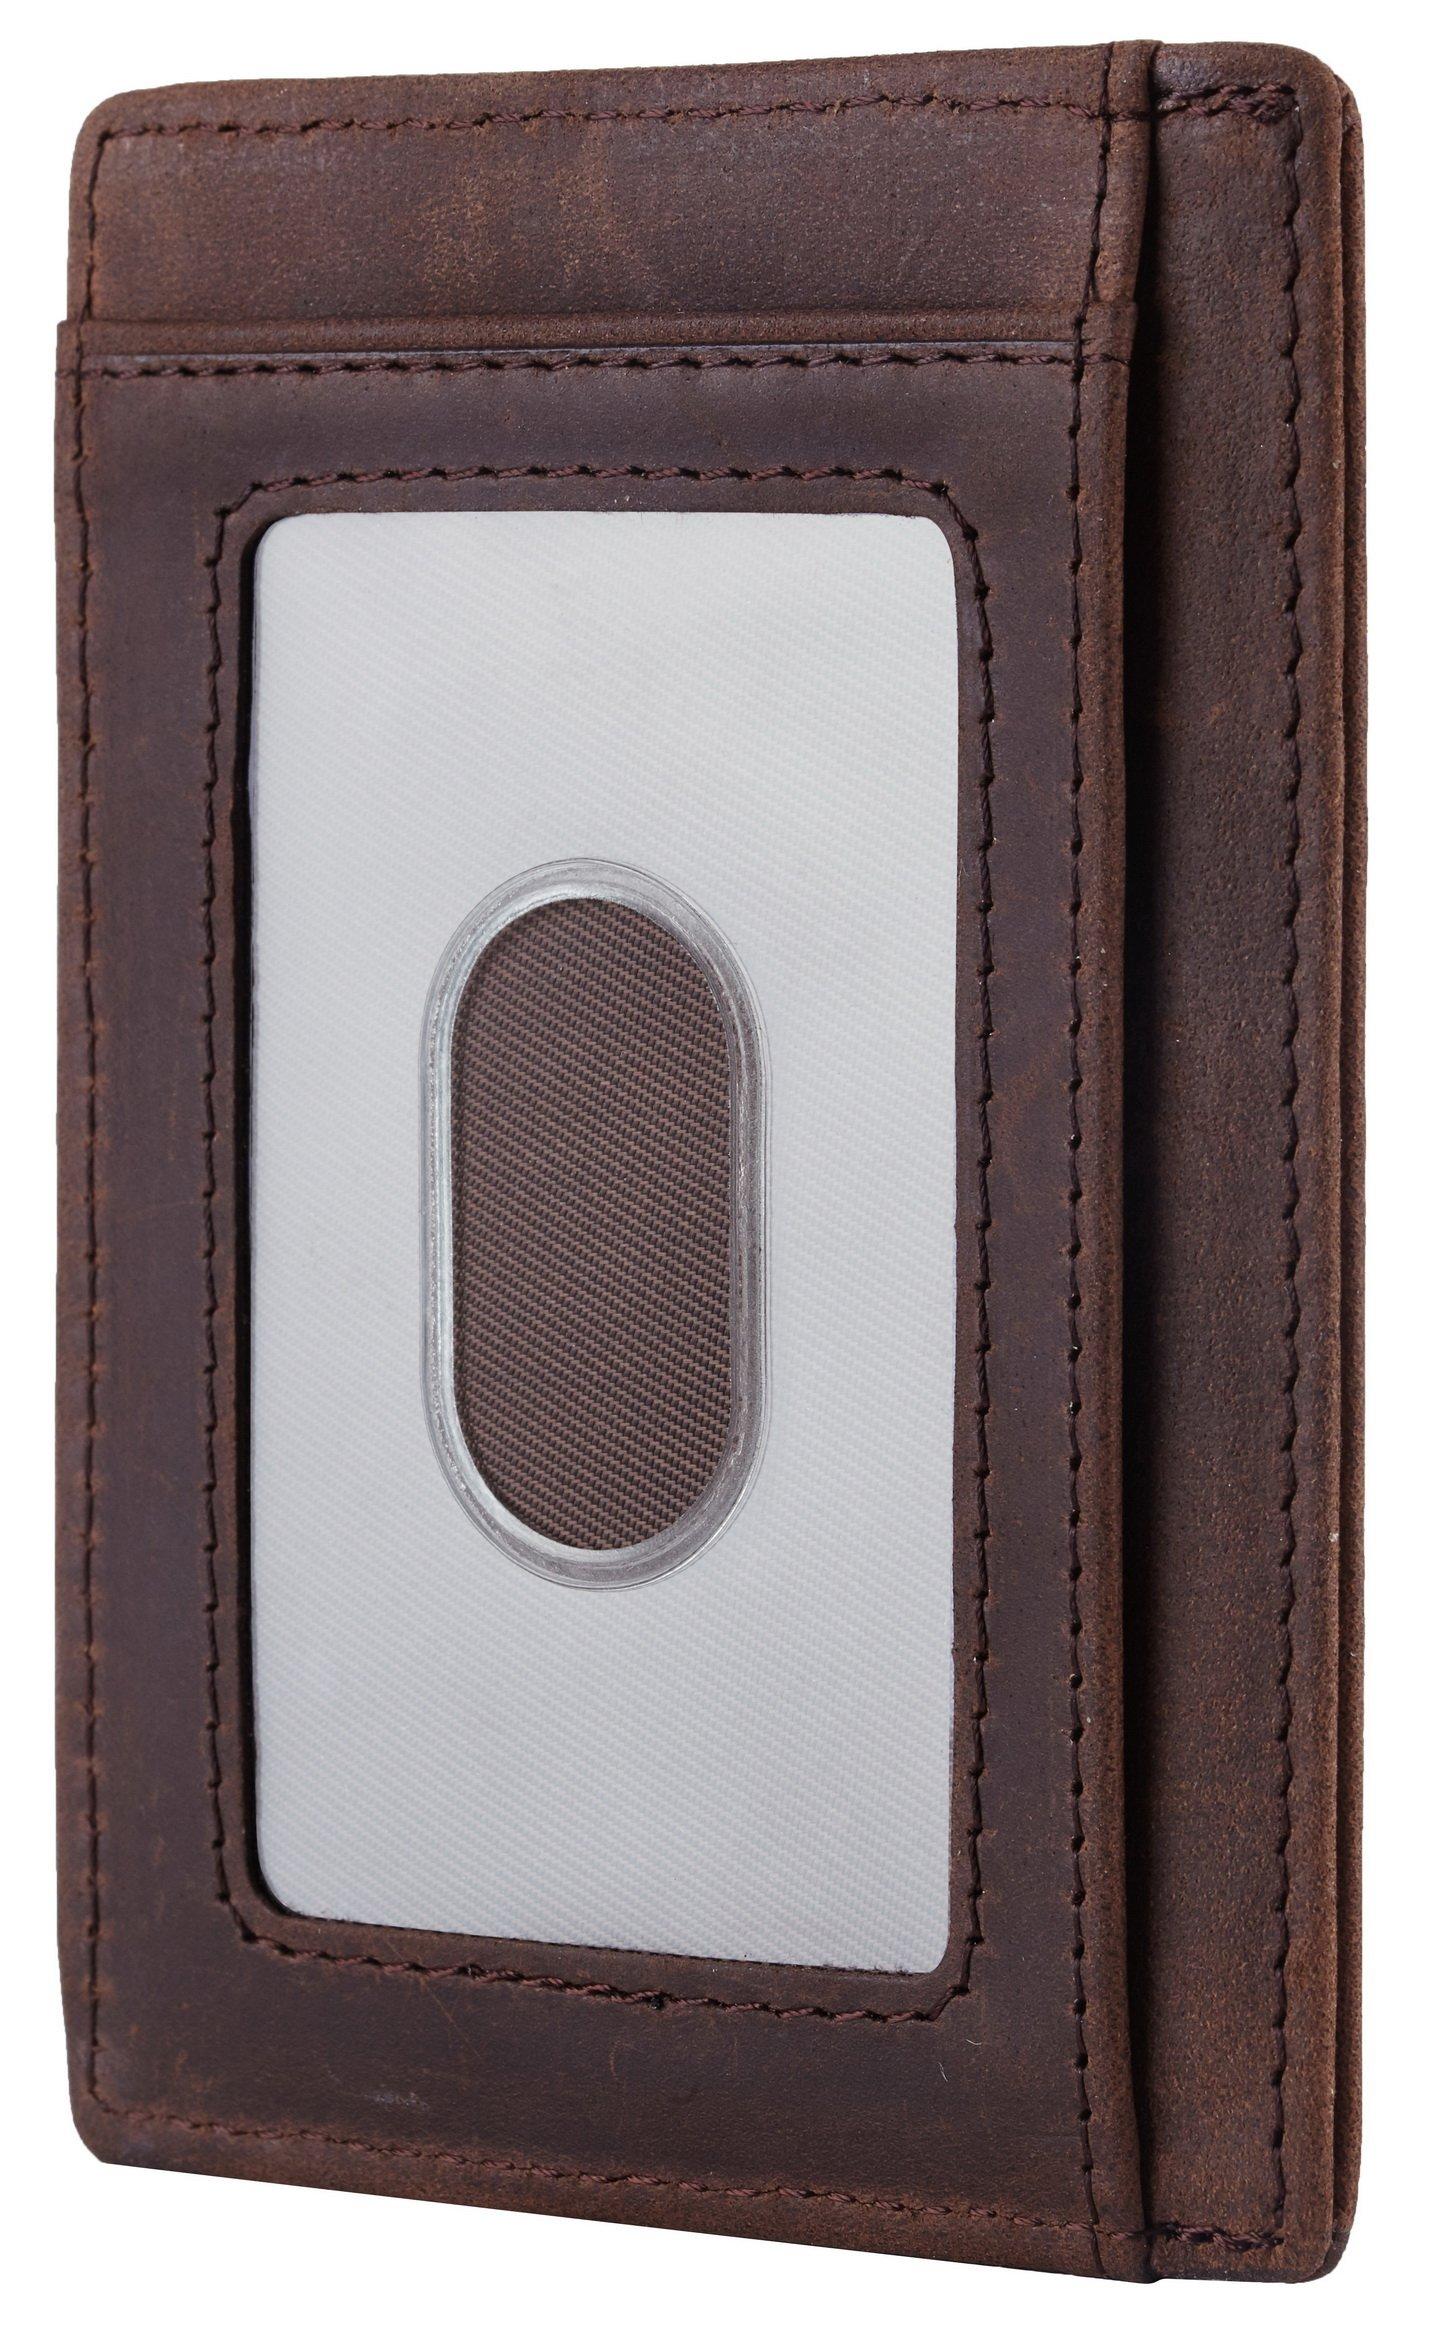 NapaWalli Wife To Husband Gift Best Anniversary Birthday Gifts For Him Genuine Leather RFID Blocking slim Wallet Card Holder (Hunter Coffee) by NapaWalli (Image #2)